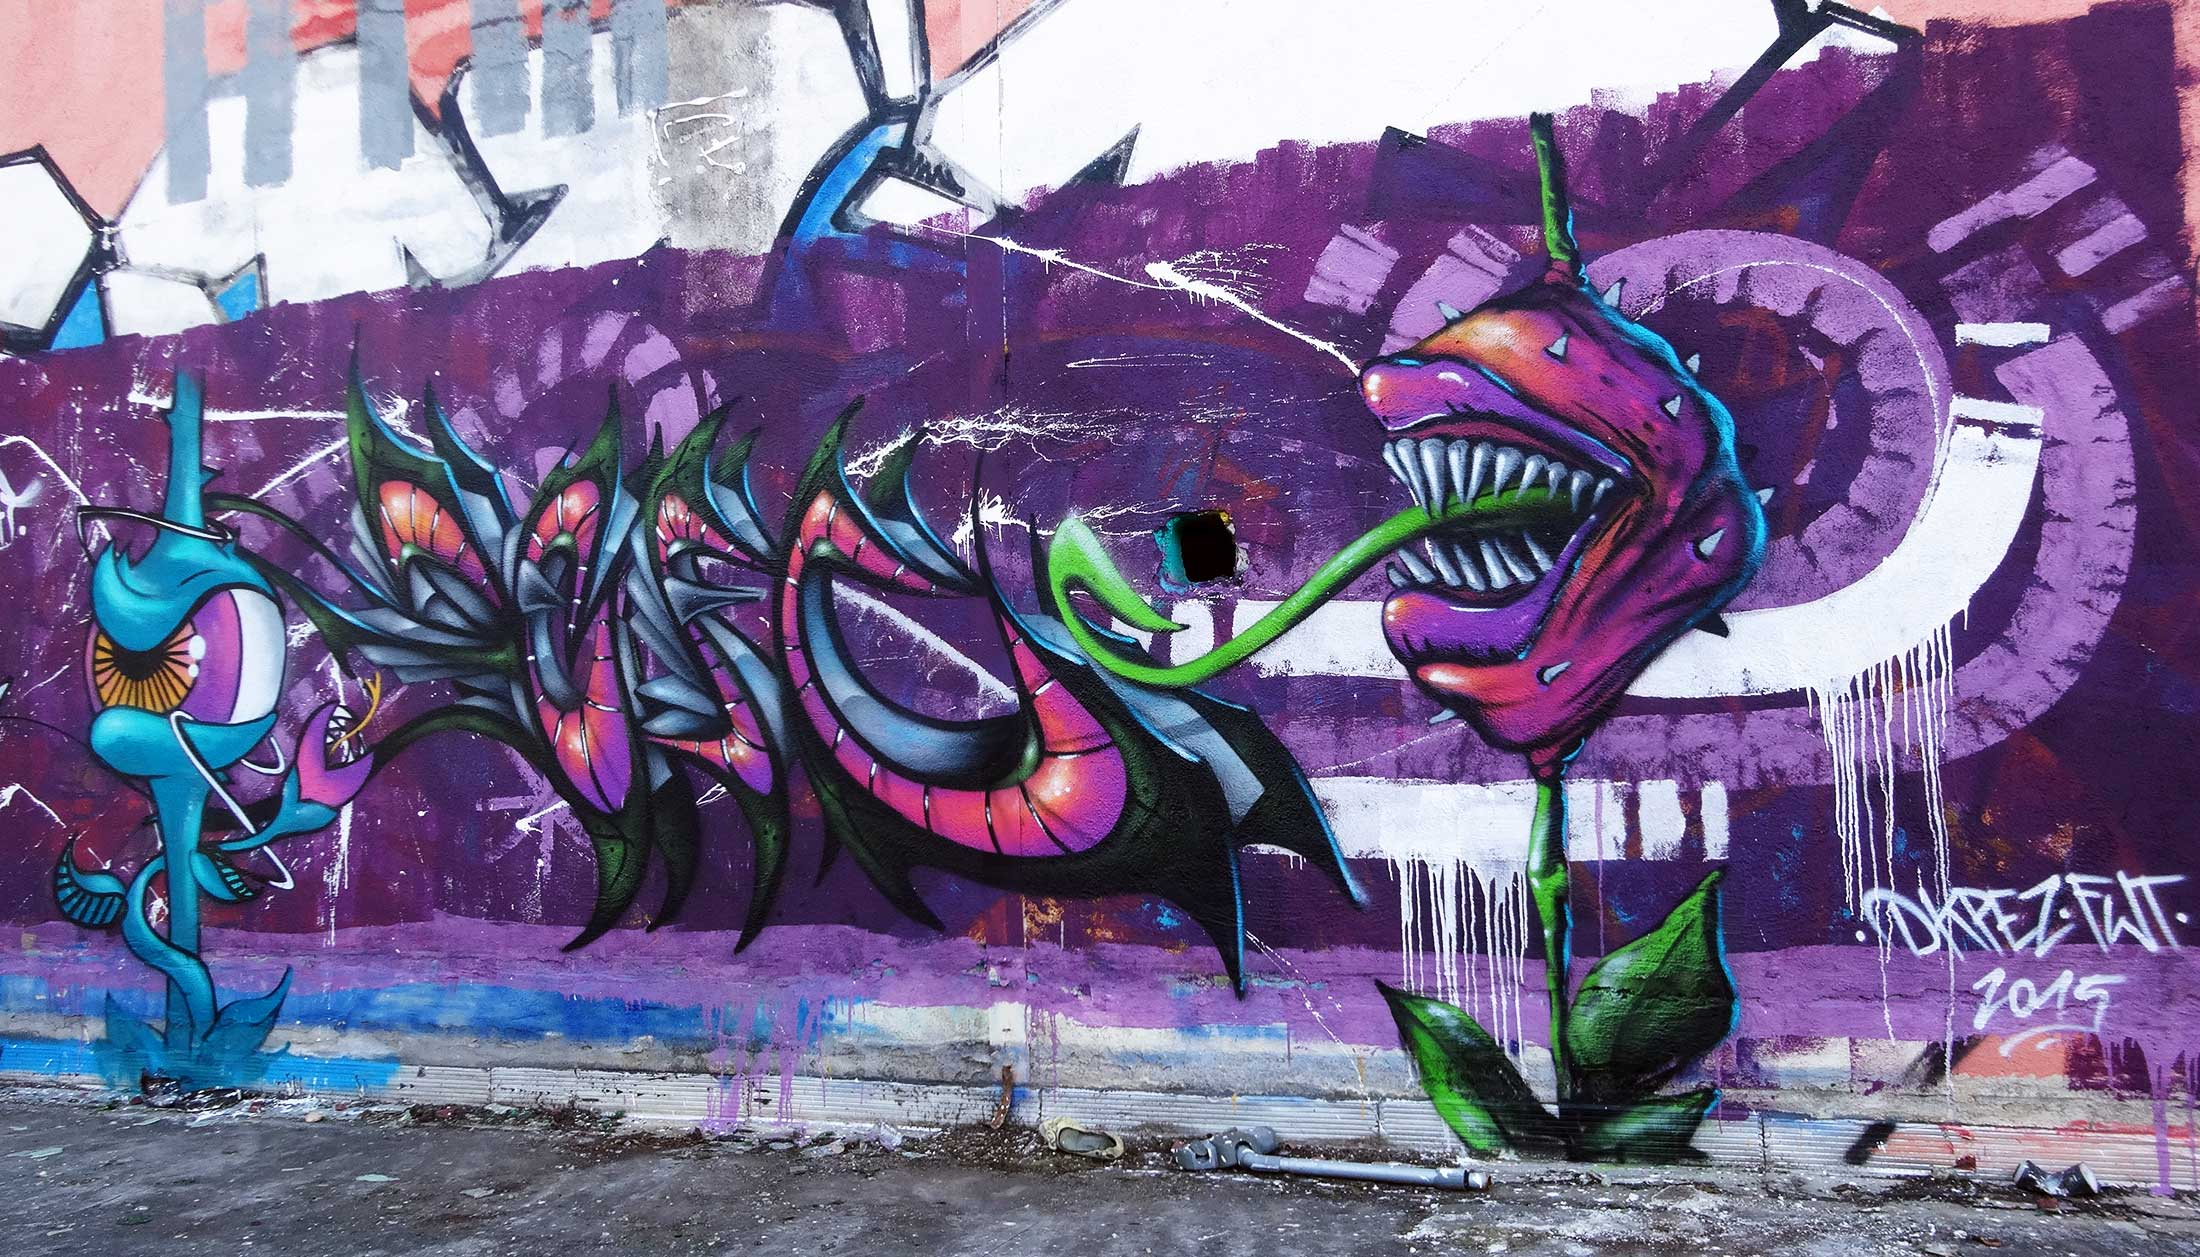 2015_04_deft_graffiti_toulouse_entrepro_ulper_dady_